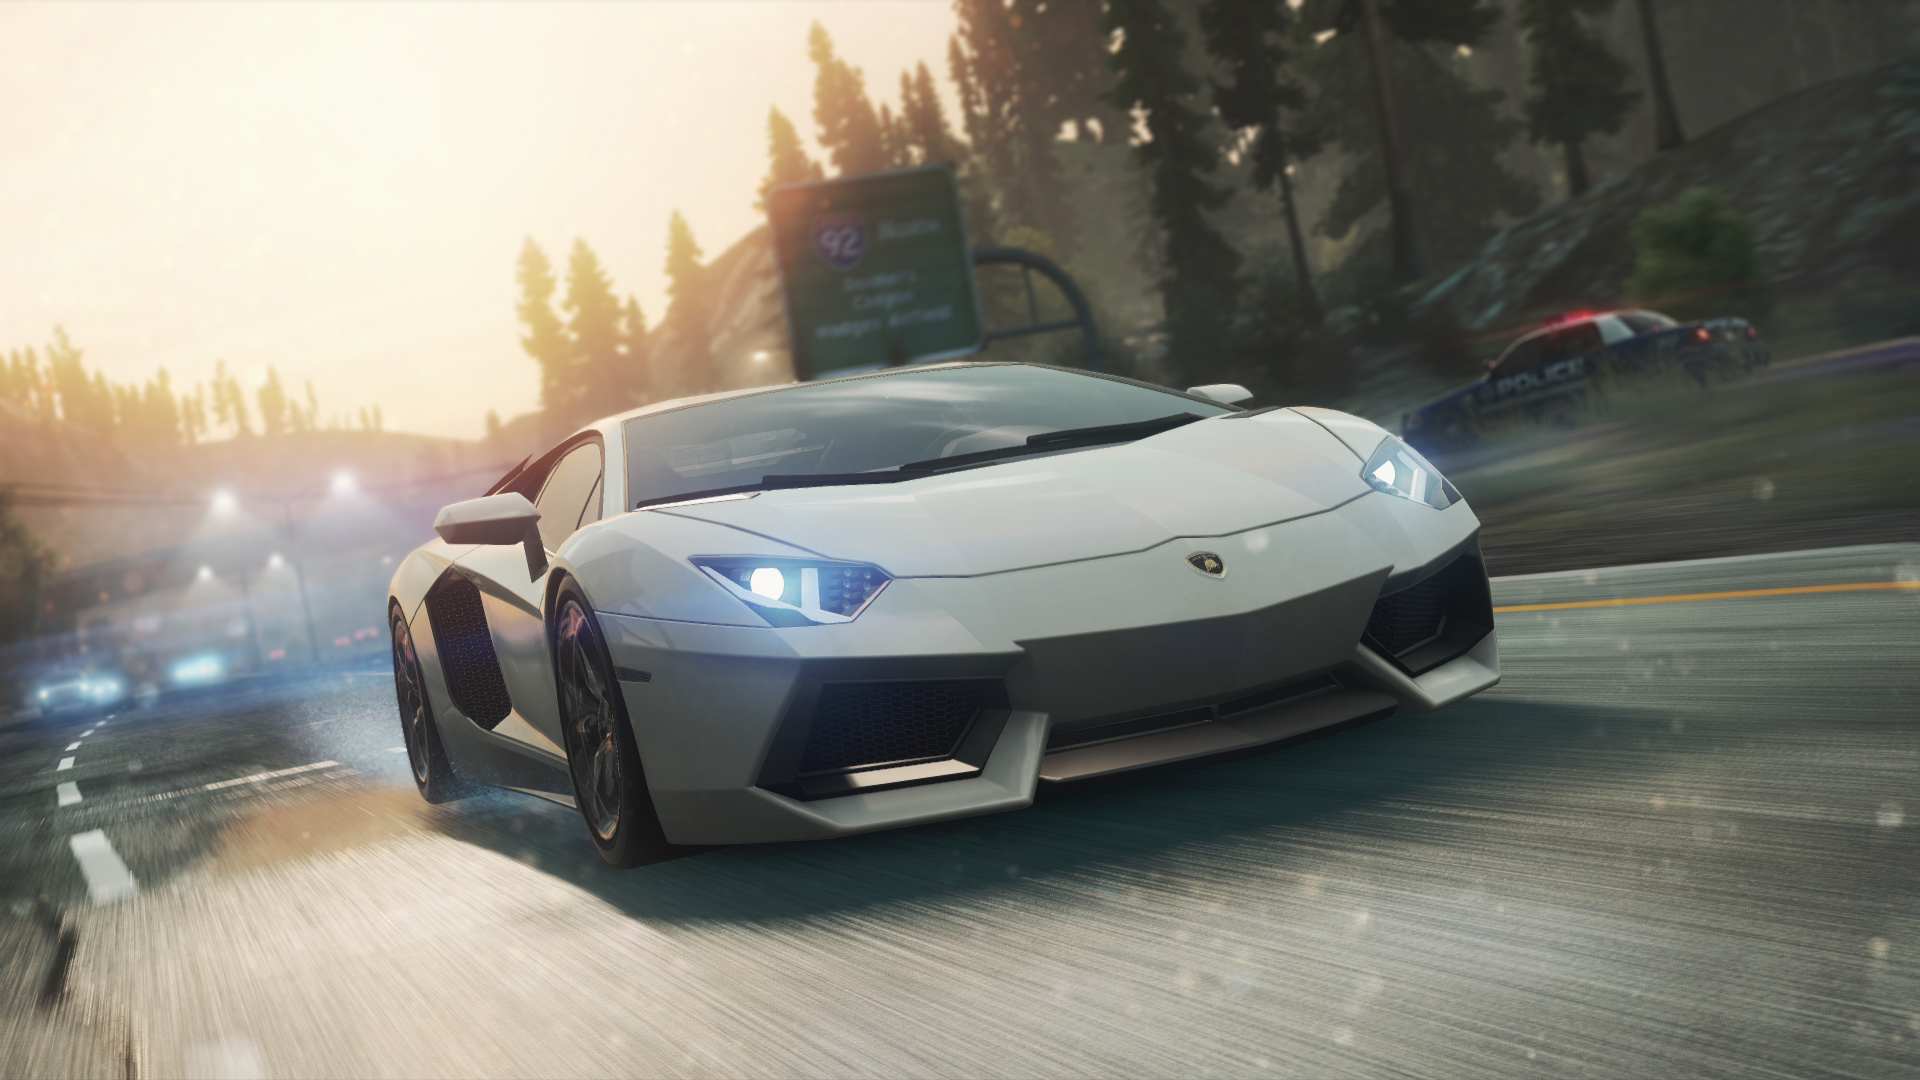 Lamborghini Aventador LP 700-4 | Need for Speed Wiki | FANDOM ...